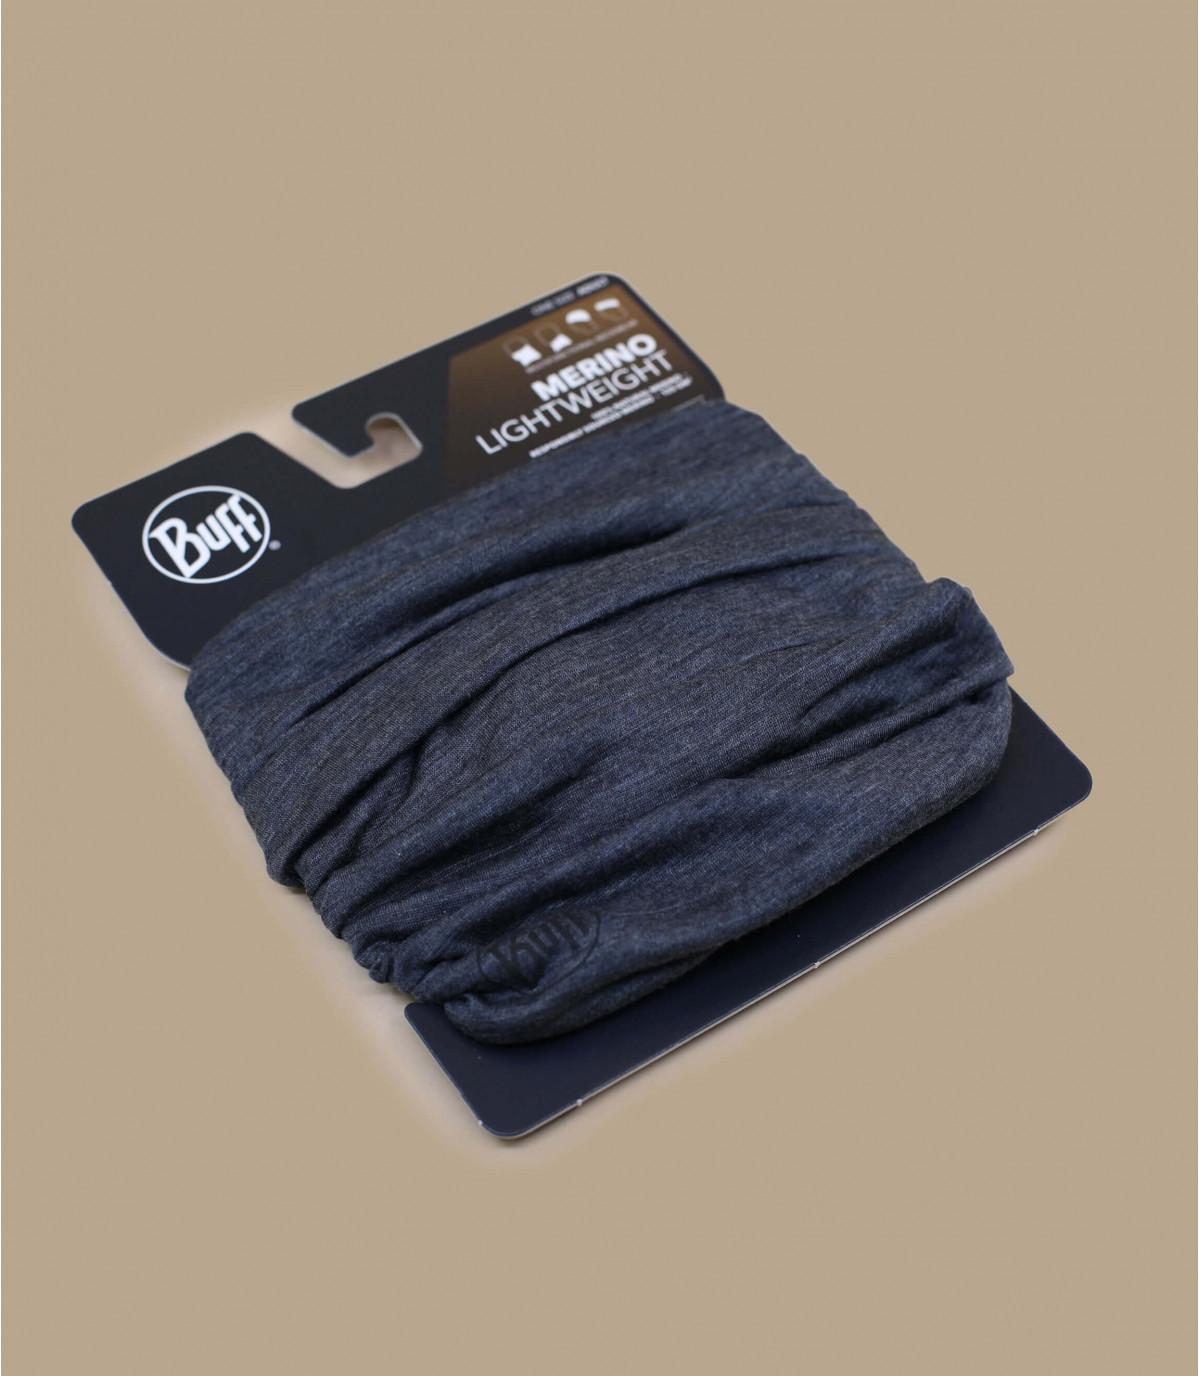 Details Lightweight Merino Wool solid grey - afbeeling 2